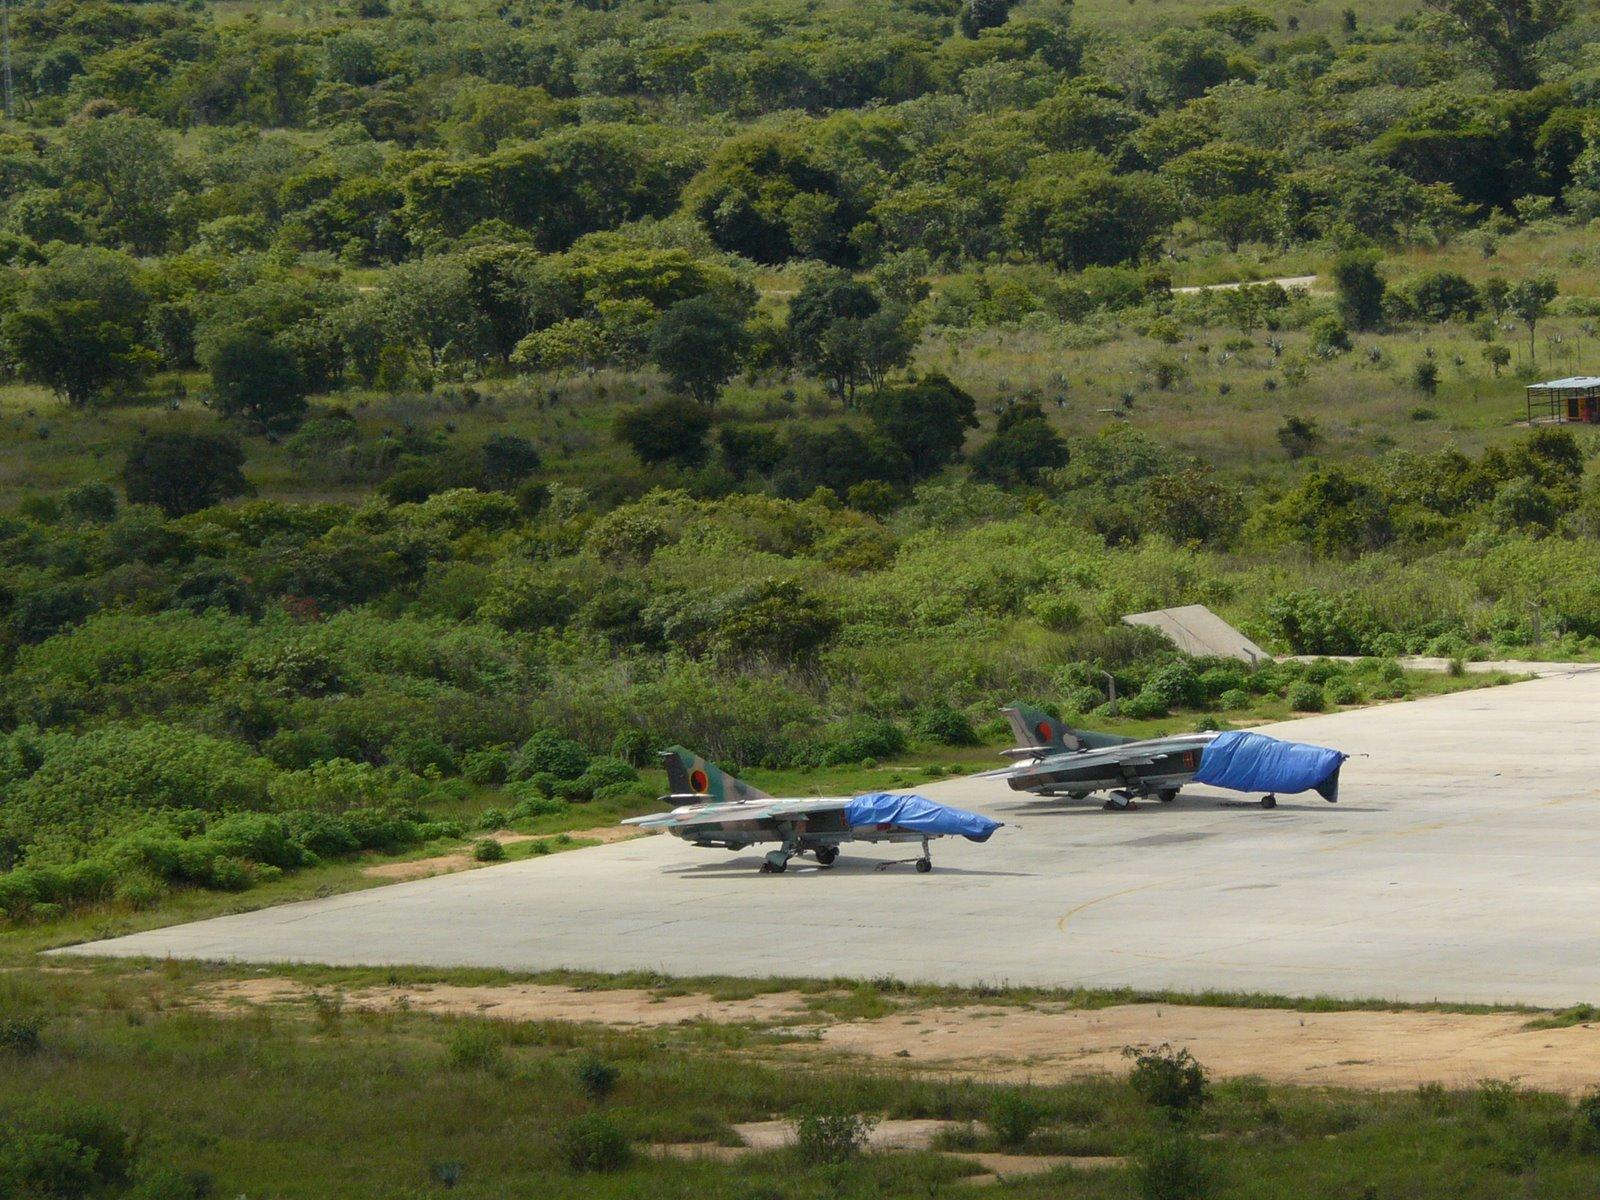 Armée Angolaise/Angolan Armed Forces ANGOLA+MIG-23+LUBANGO+JOAO+CALDEIRA+HUILA+03-03-2008